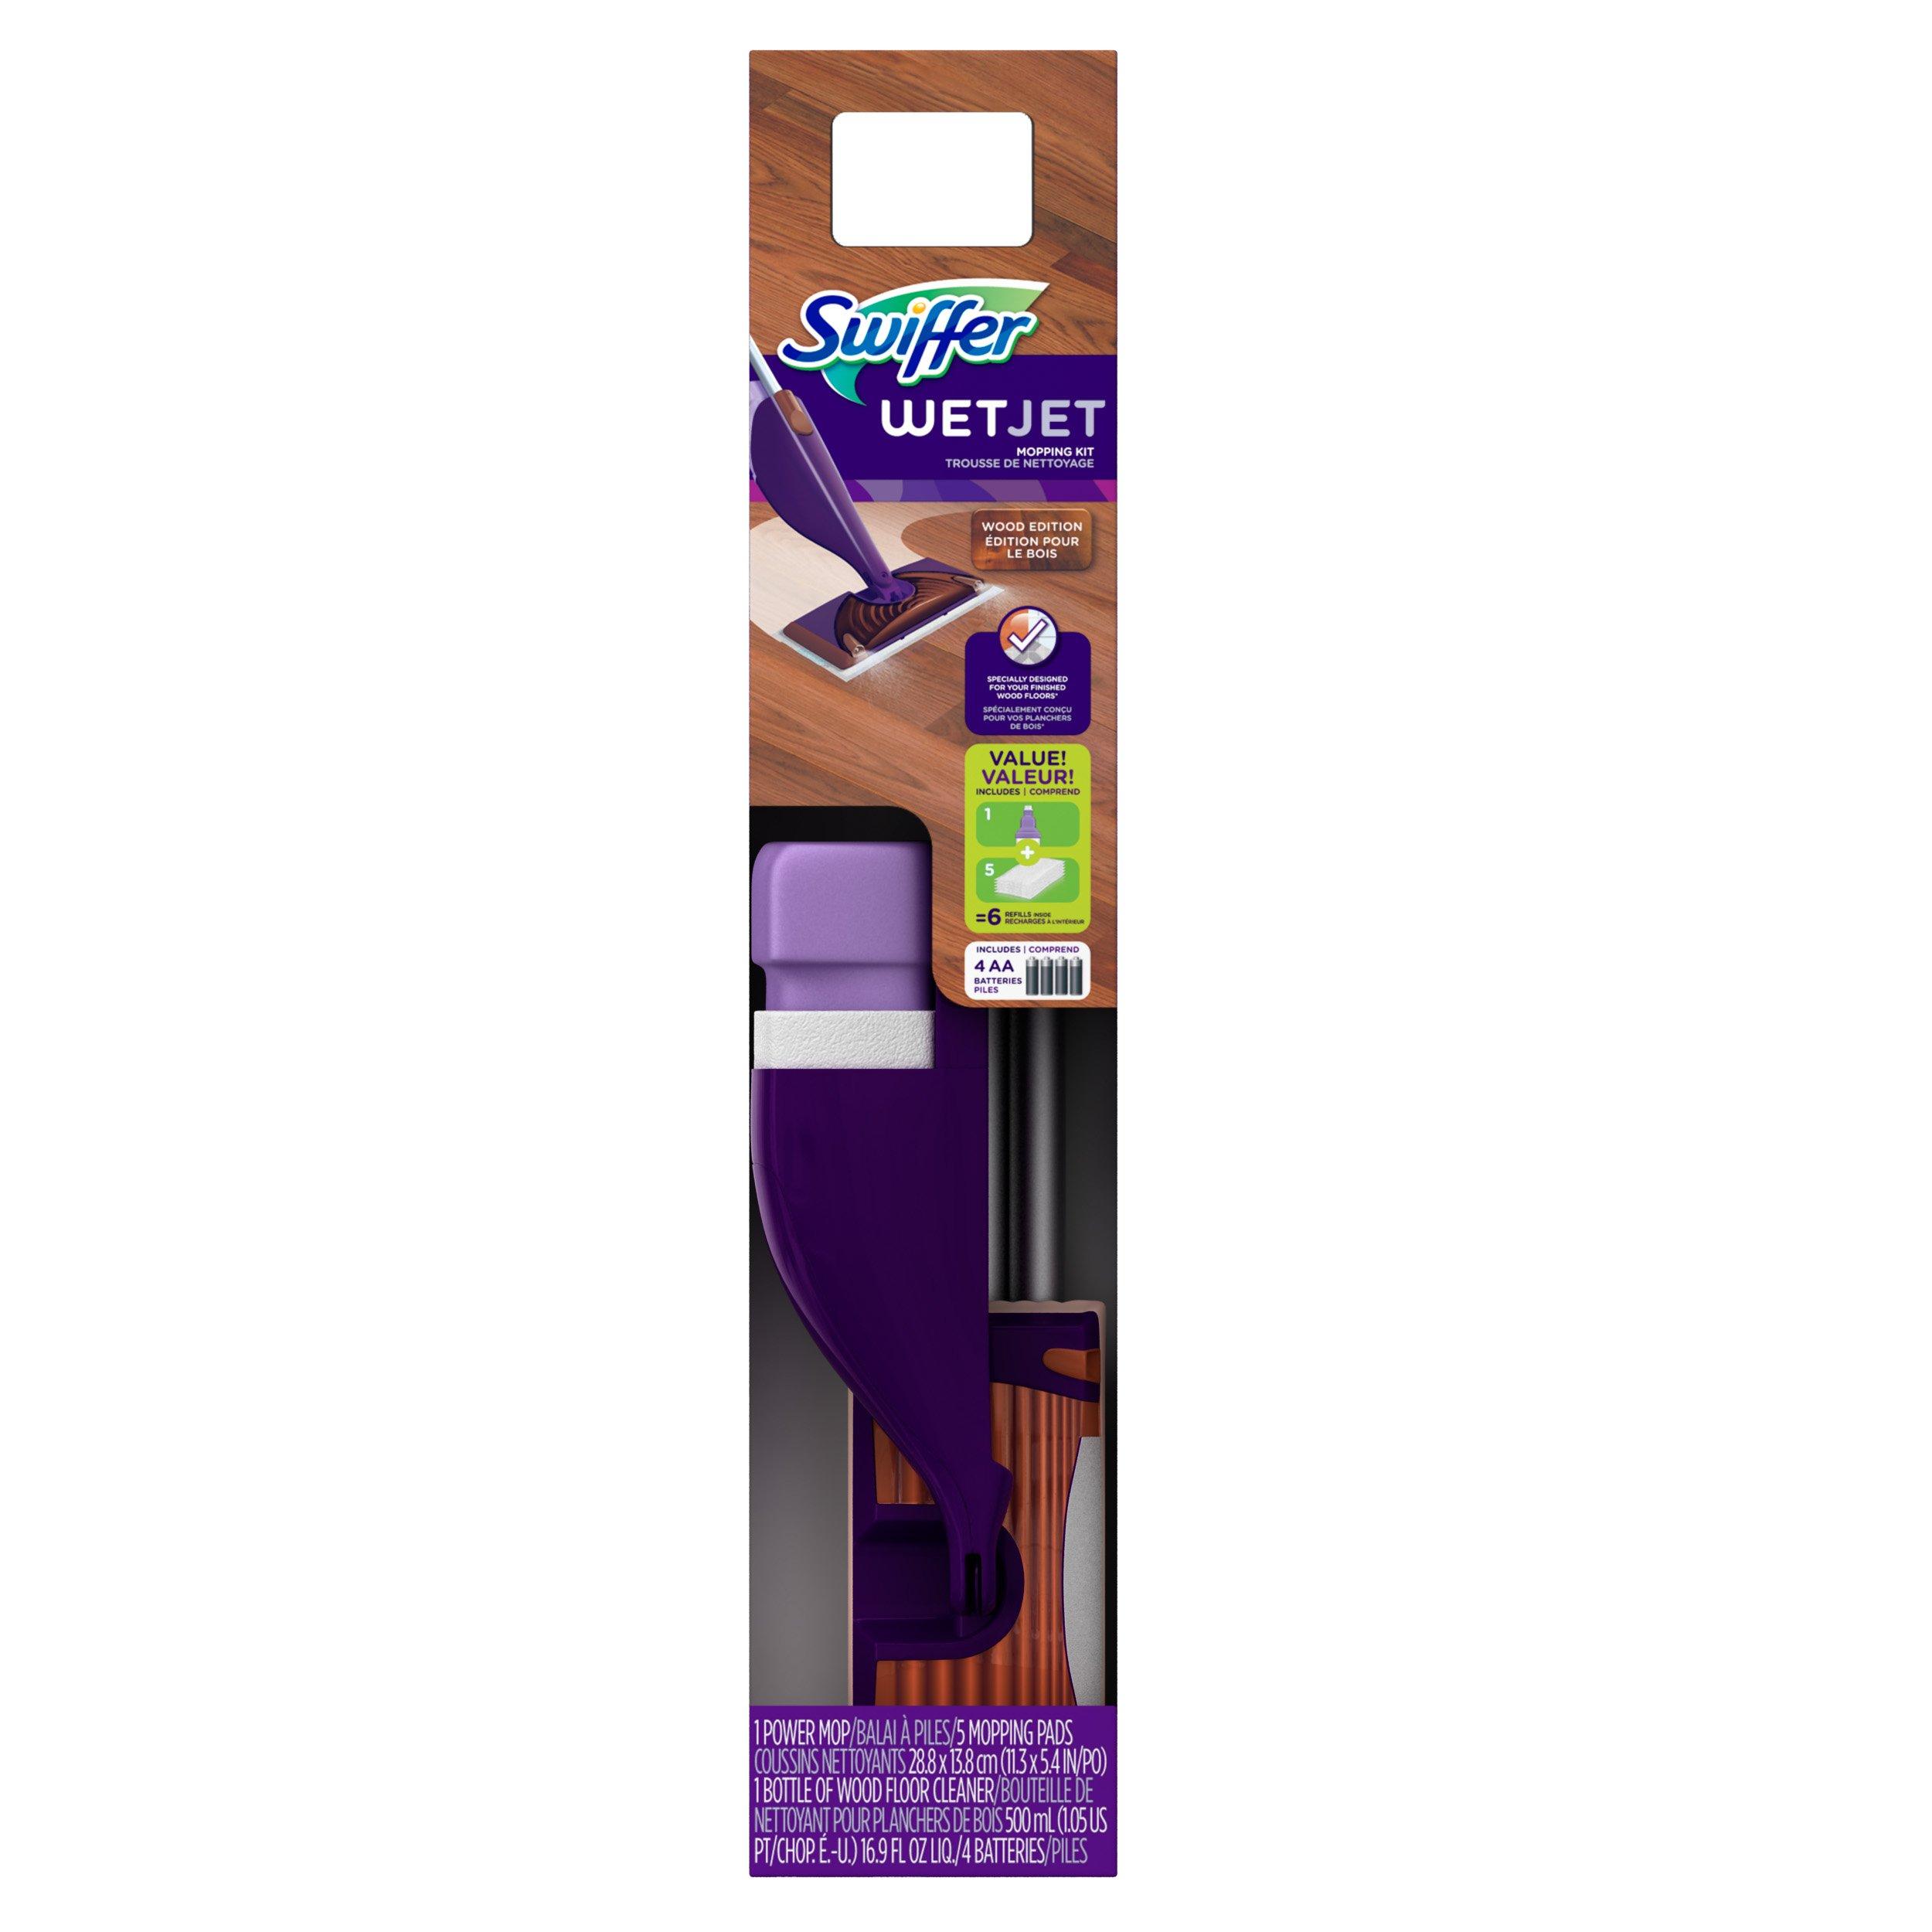 Swiffer Wetjet Wood Starter Kit